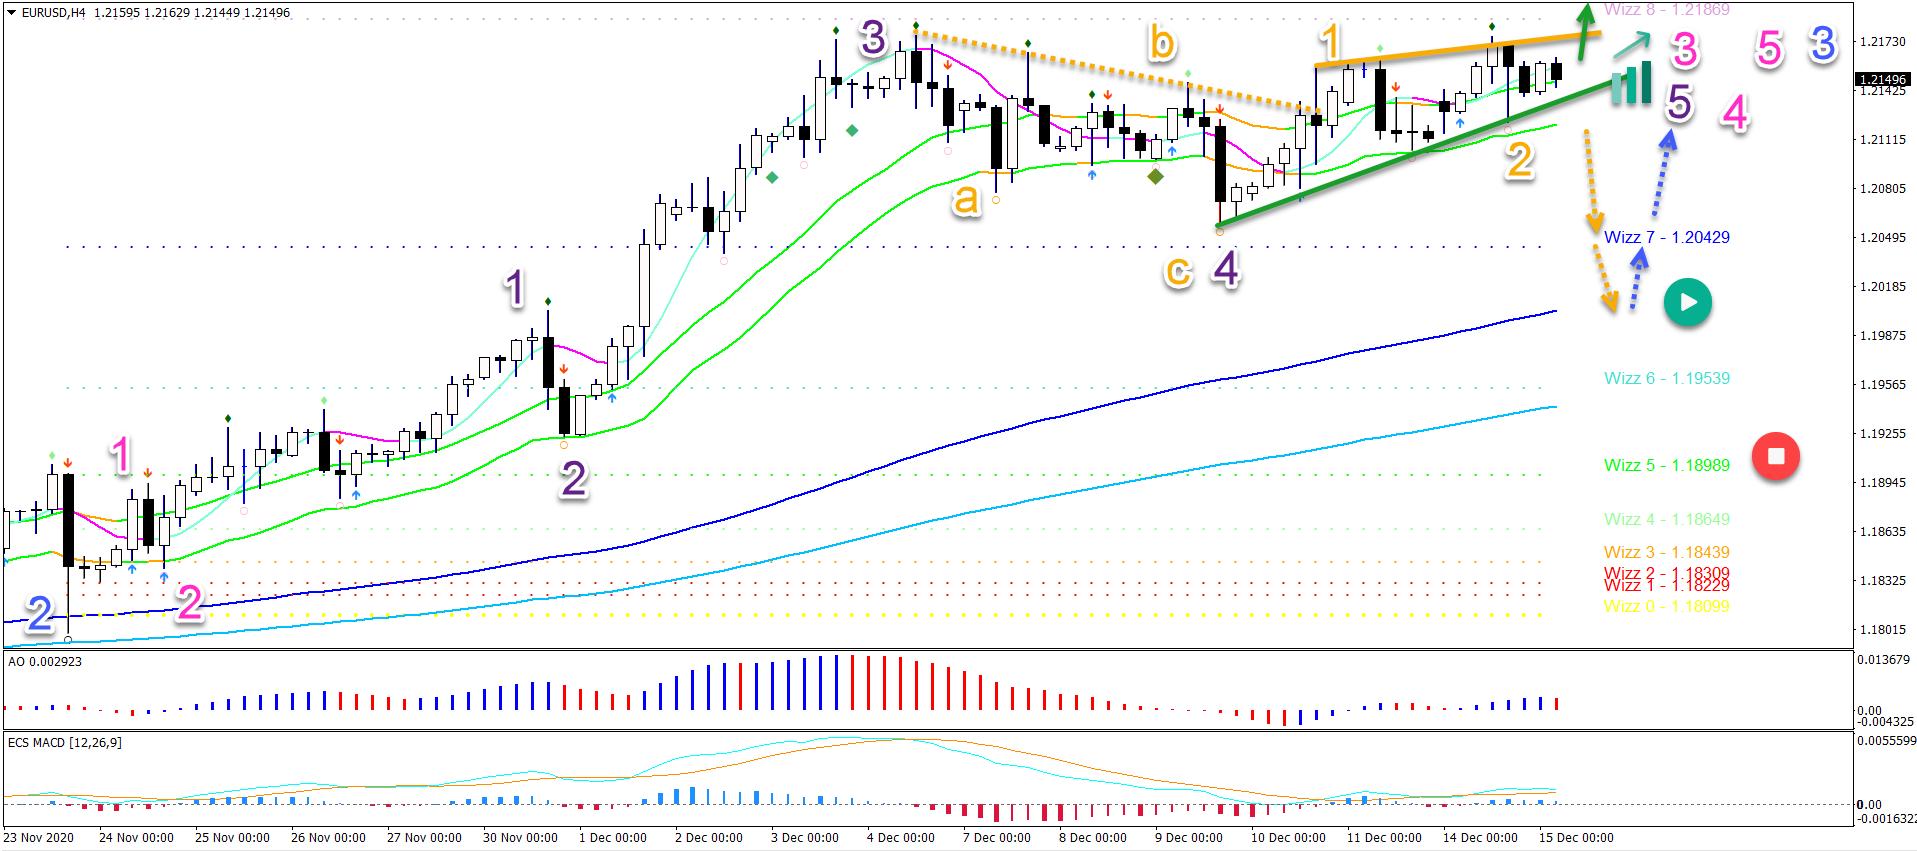 EUR/USD 4 hour chart 15.12.2020